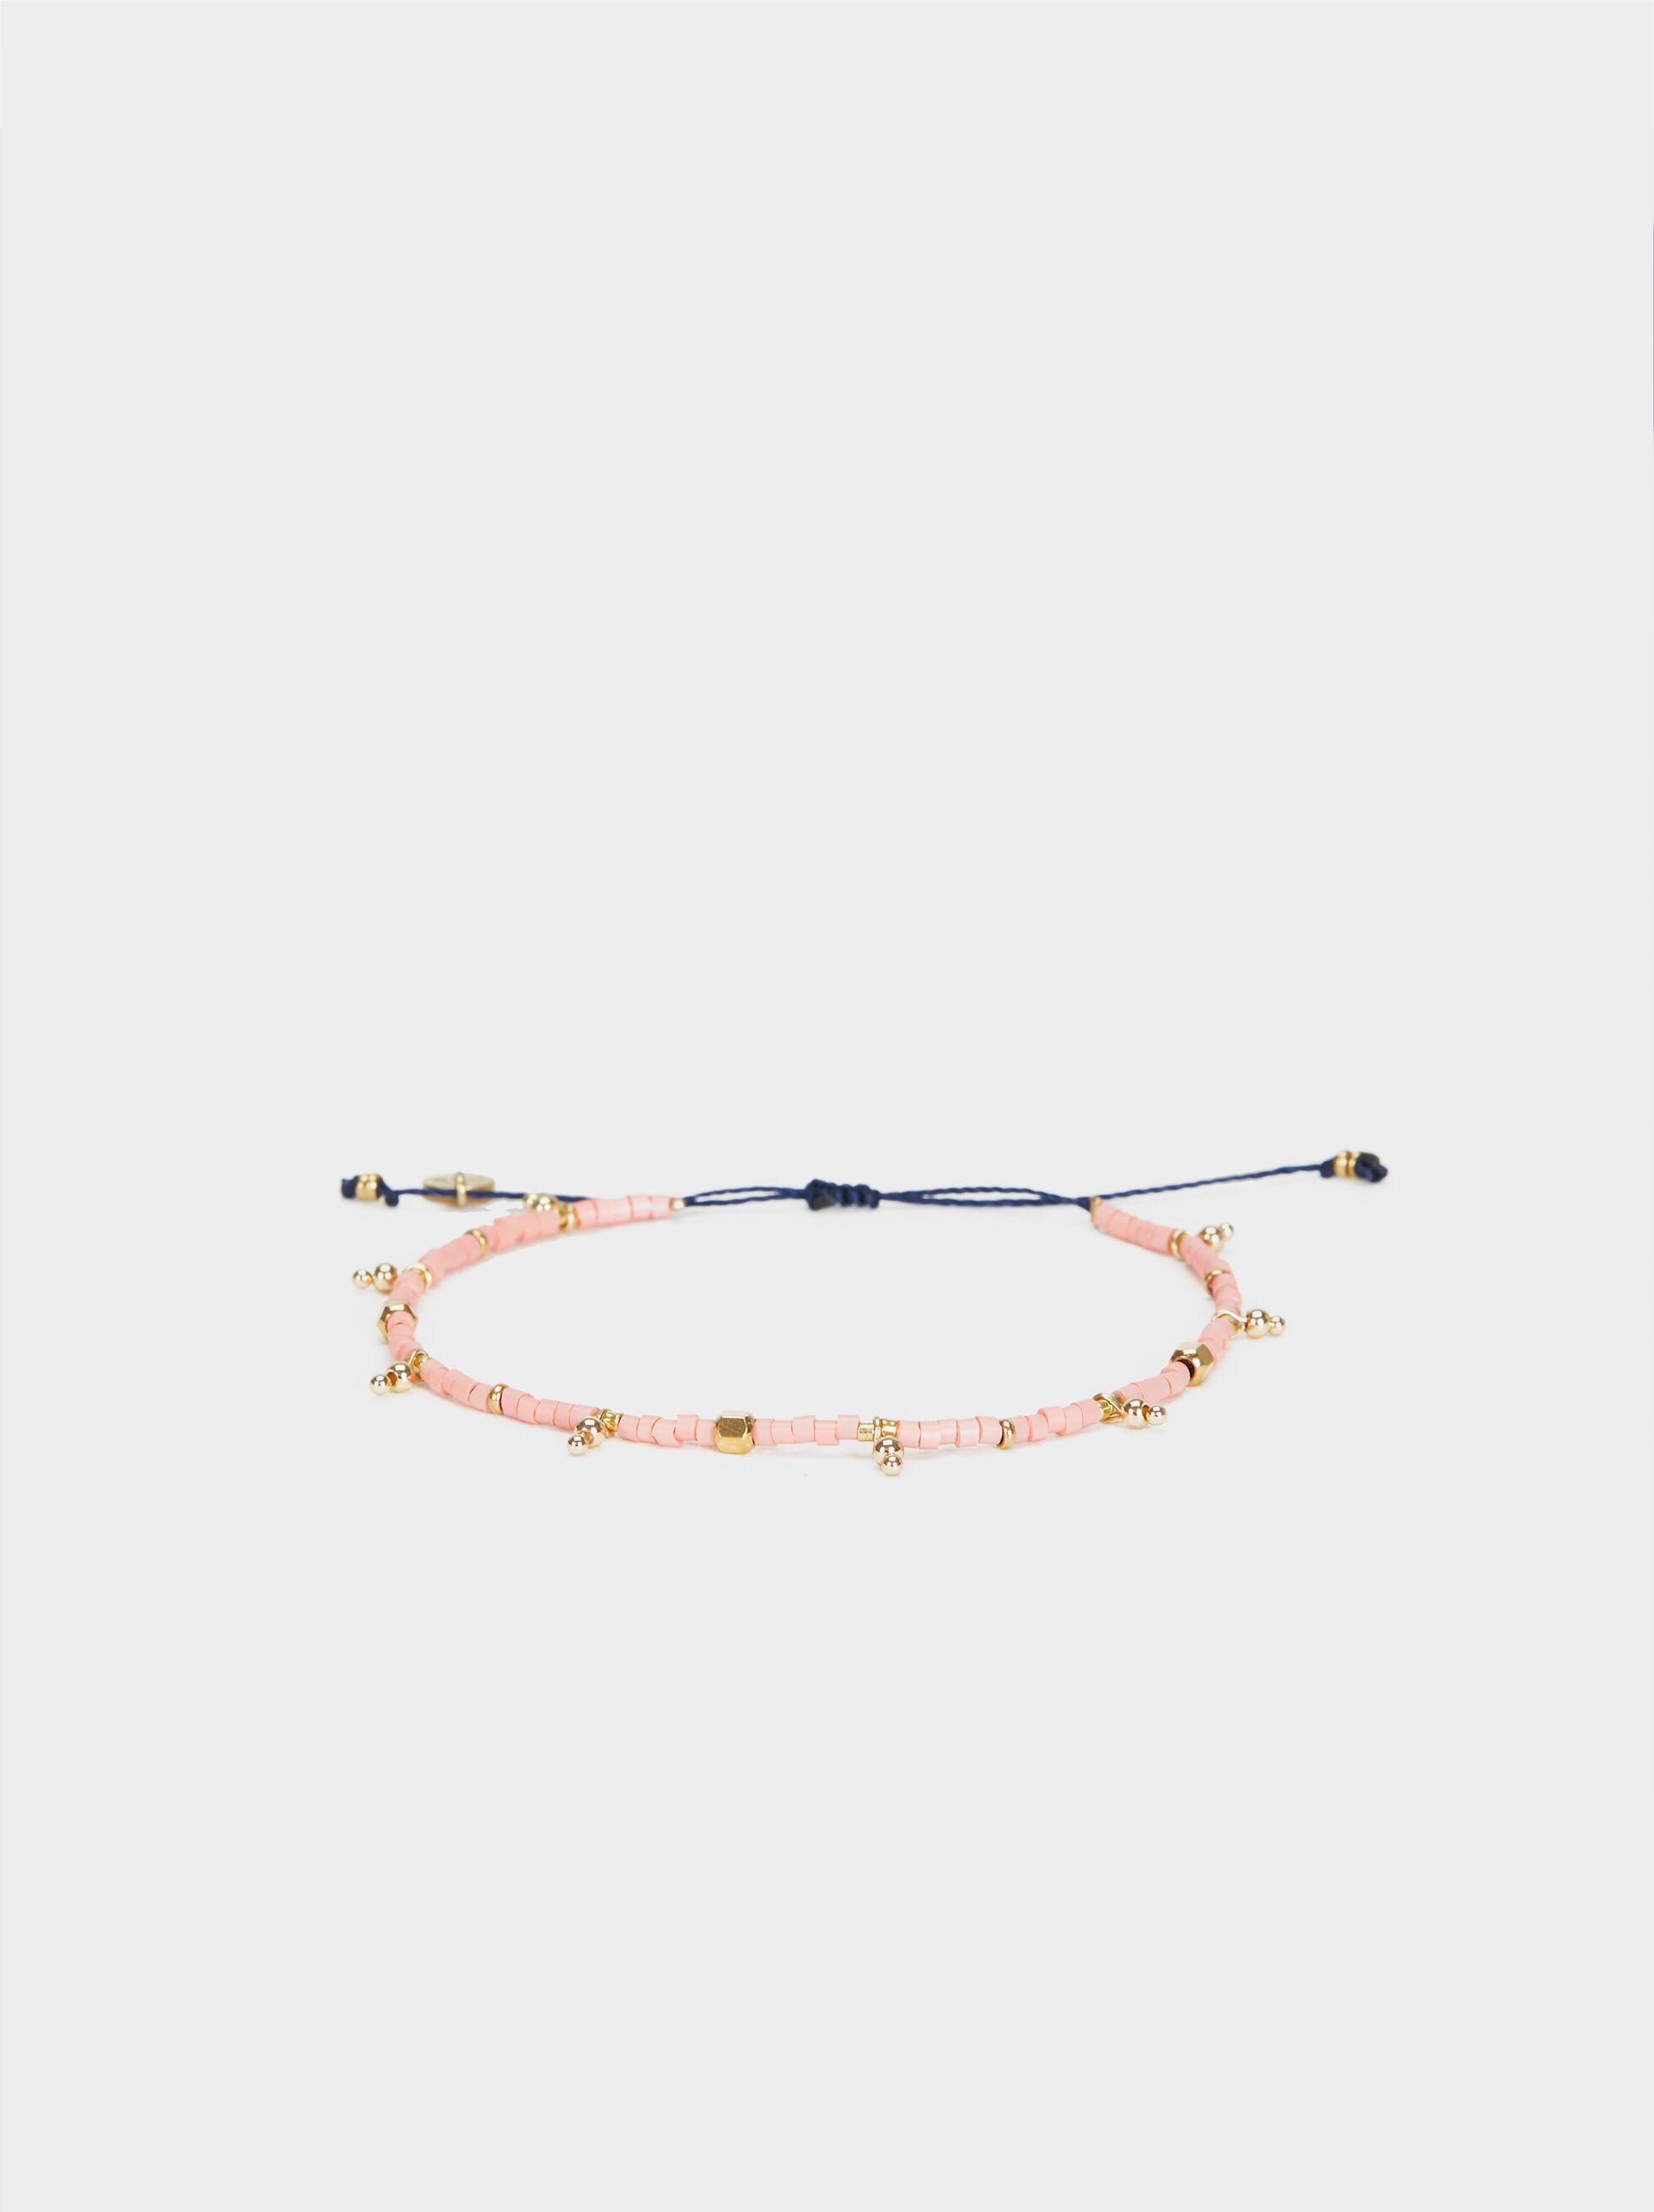 Adjustable Bracelet With Beads, Red, hi-res